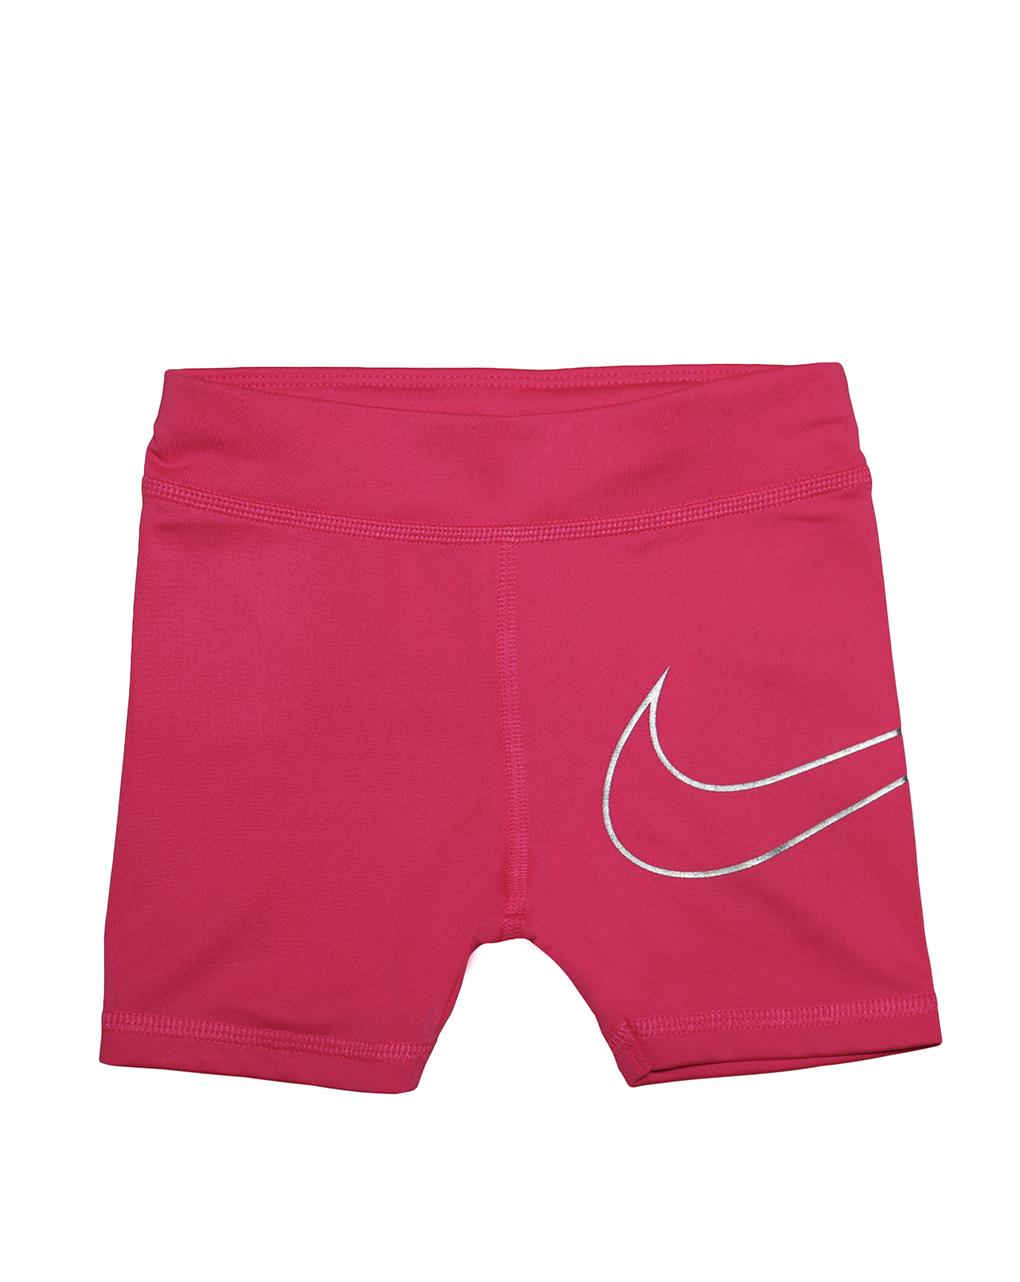 Shorts bambina nike - Nike